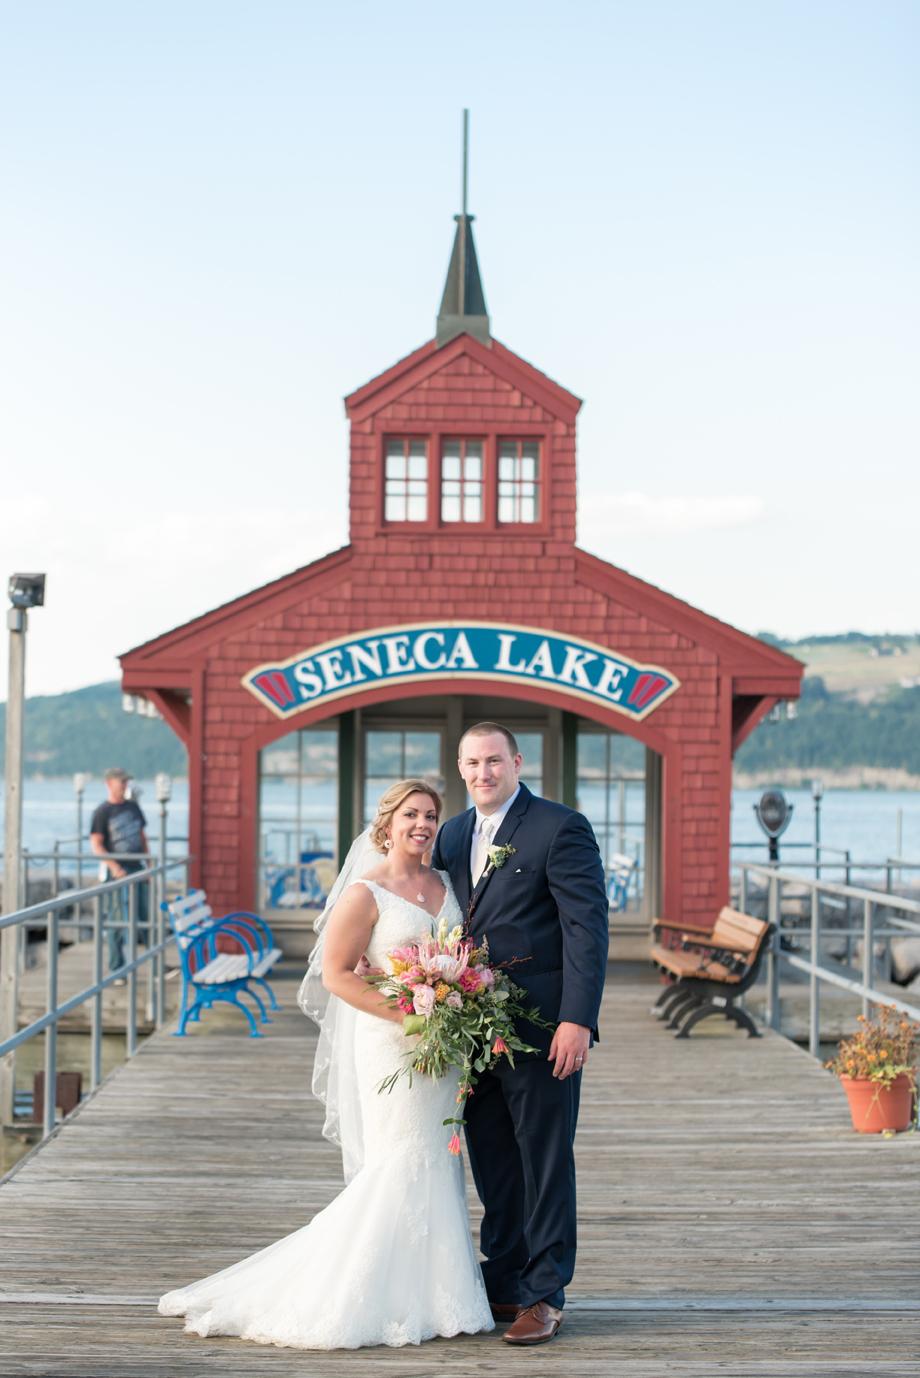 Wedding photography by Smile Peace Love Creative, taken at the Watkins Glen Harbor Hotel on Seneca Lake in Watkins Glen, NY. Finger Lakes Wedding Photographer. Watkins Glen Wedding Photographer.